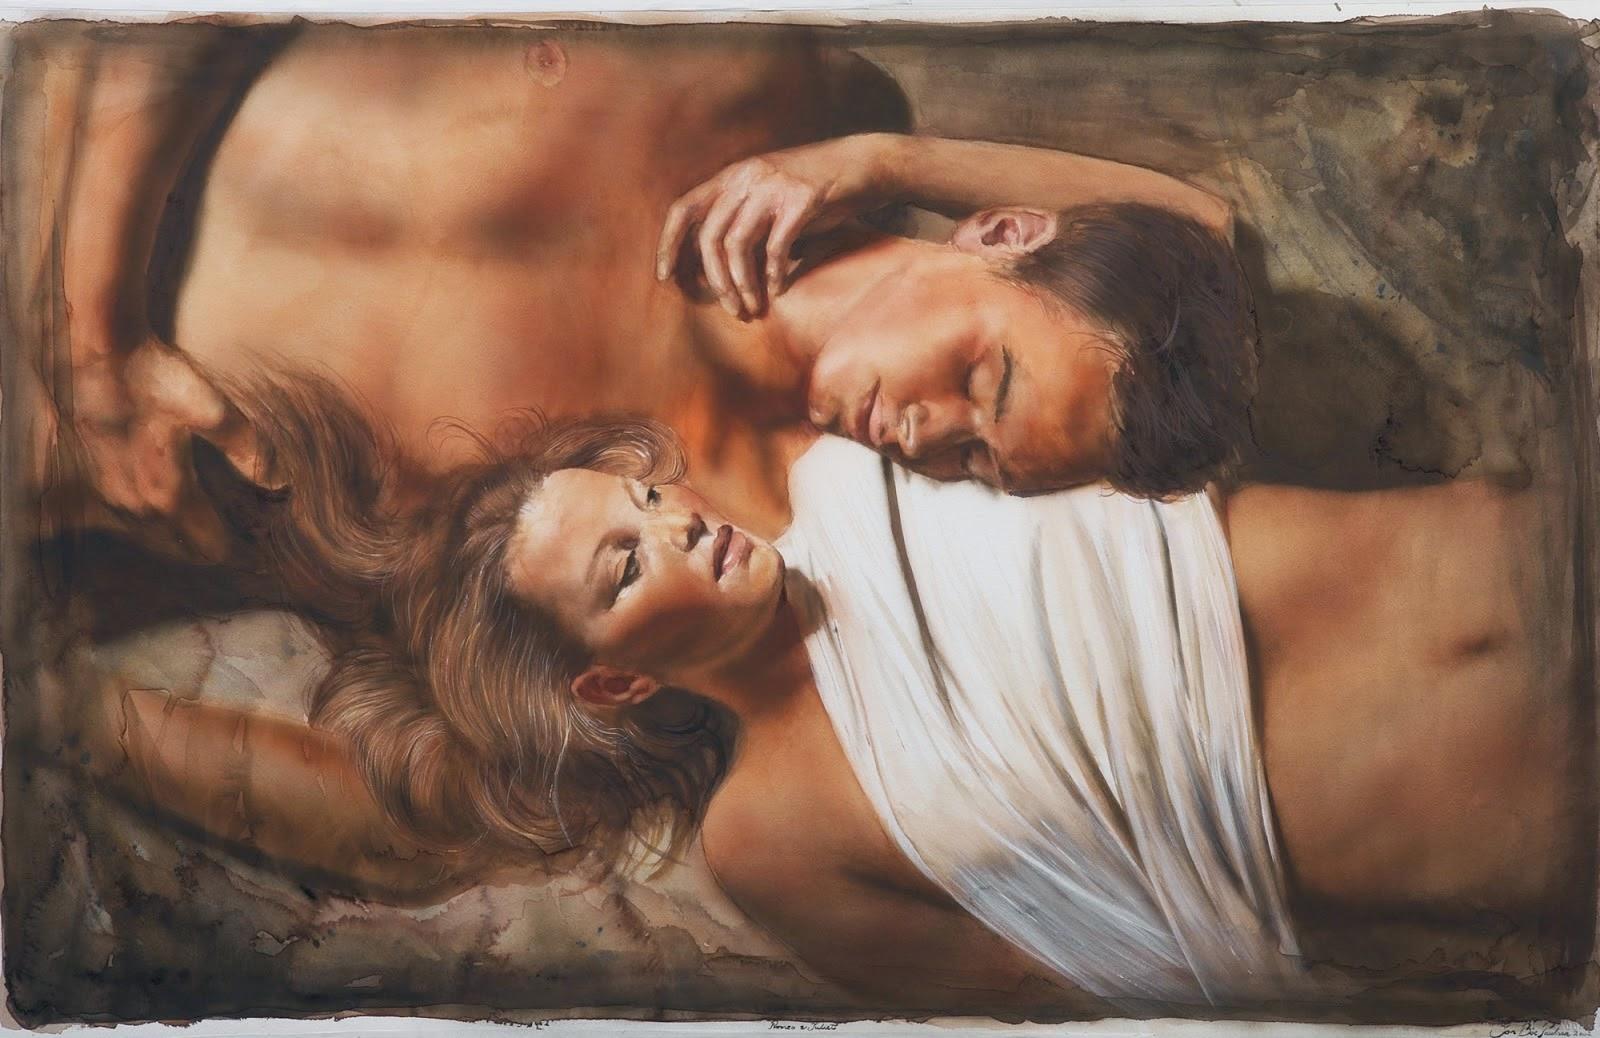 intimidade, sexo, tempo, Sobonfu Somé, o espírito da intimidade, romance, medo, relacionamentos